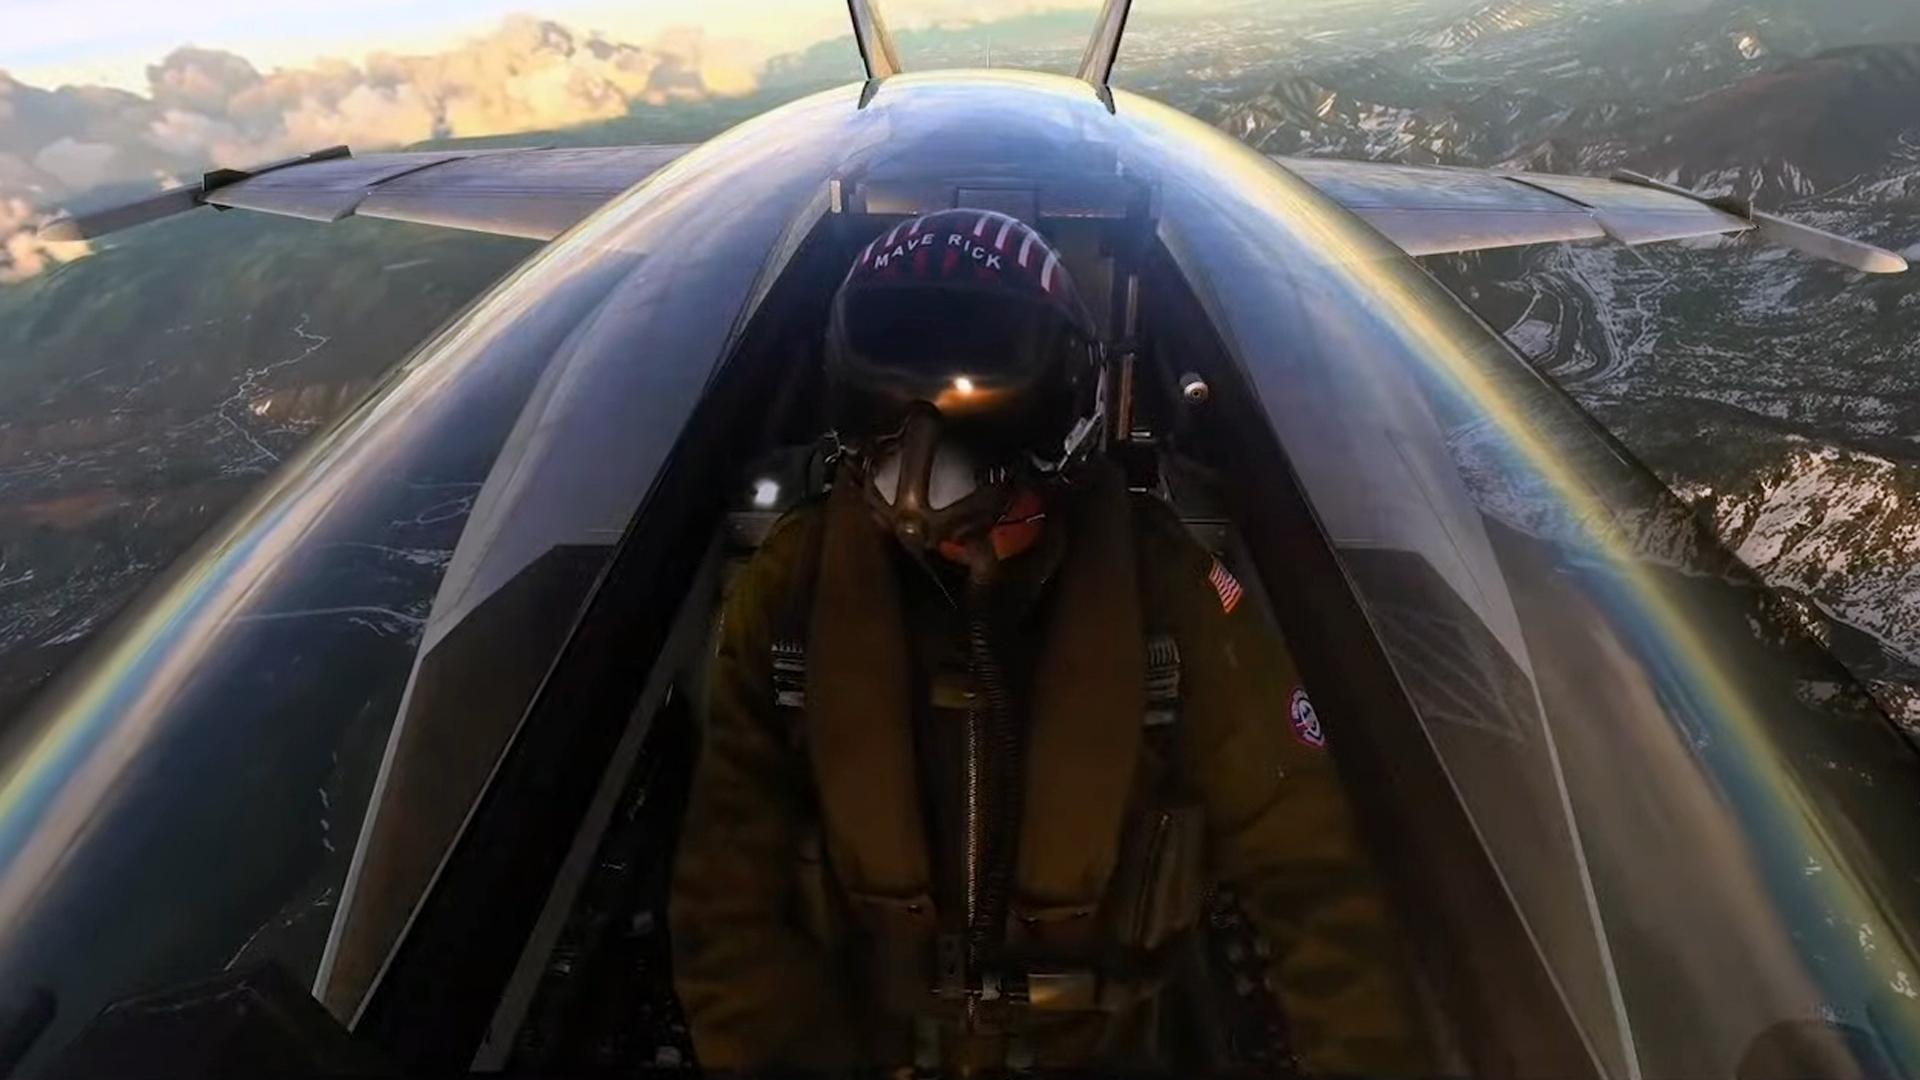 Microsoft Flight Simulator's Top Gun DLC is delayed thanks to Top Gun: Maverick